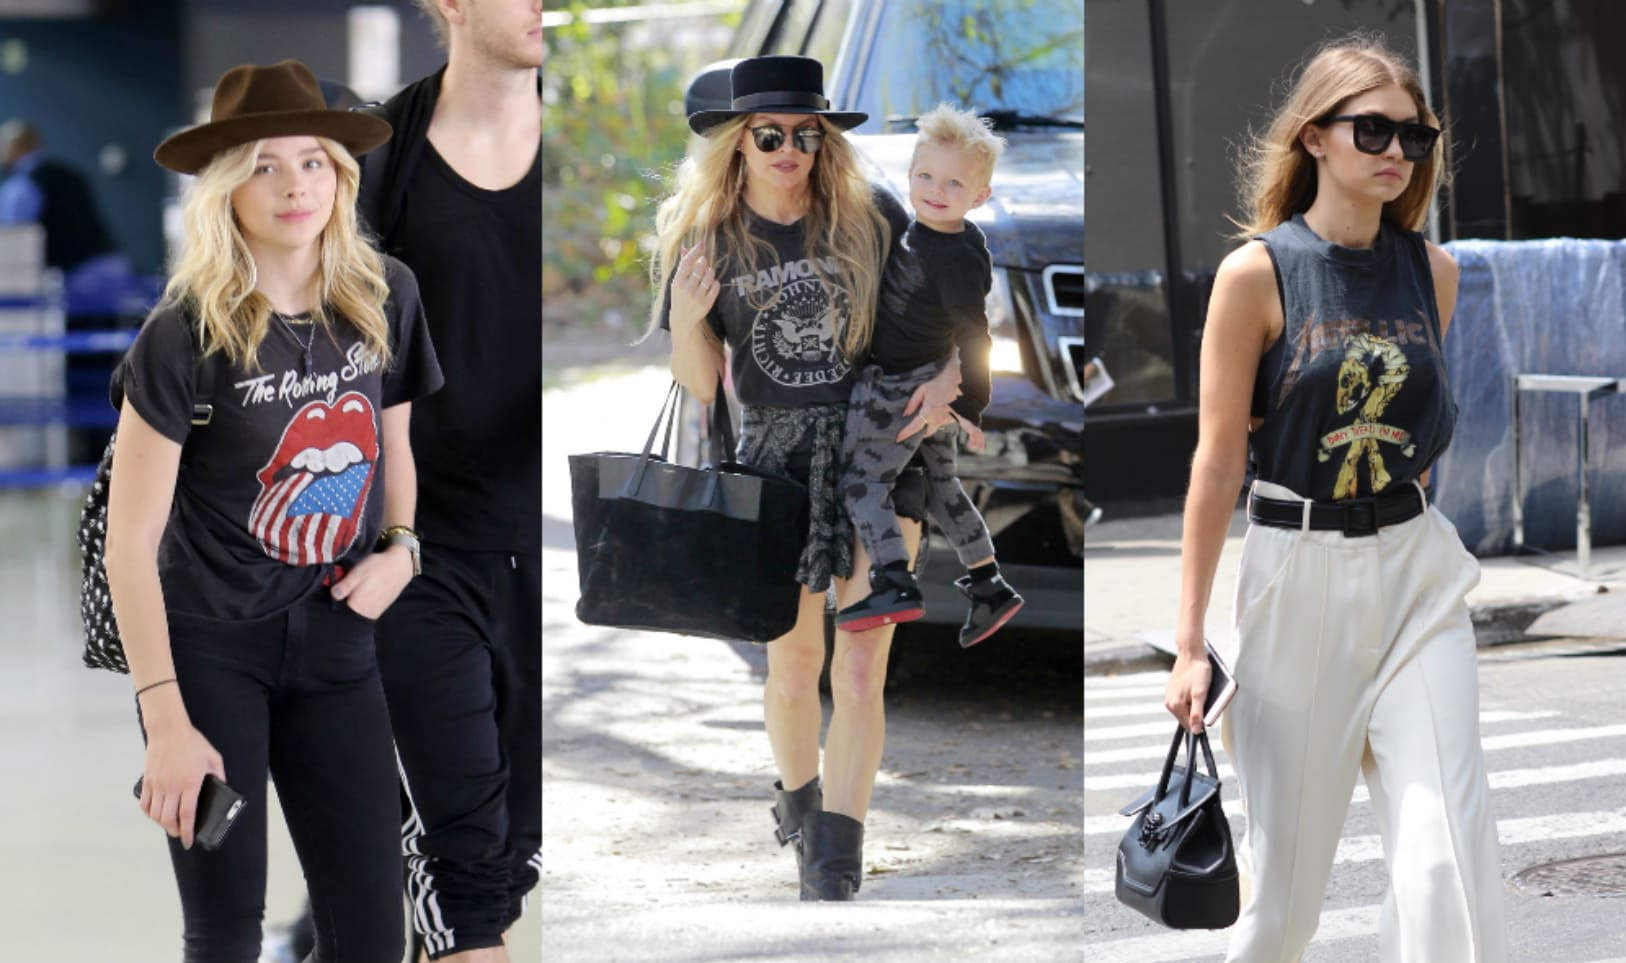 Chloe Moretz, Fergie, and Gigi Hadid wearing rock and roll tees